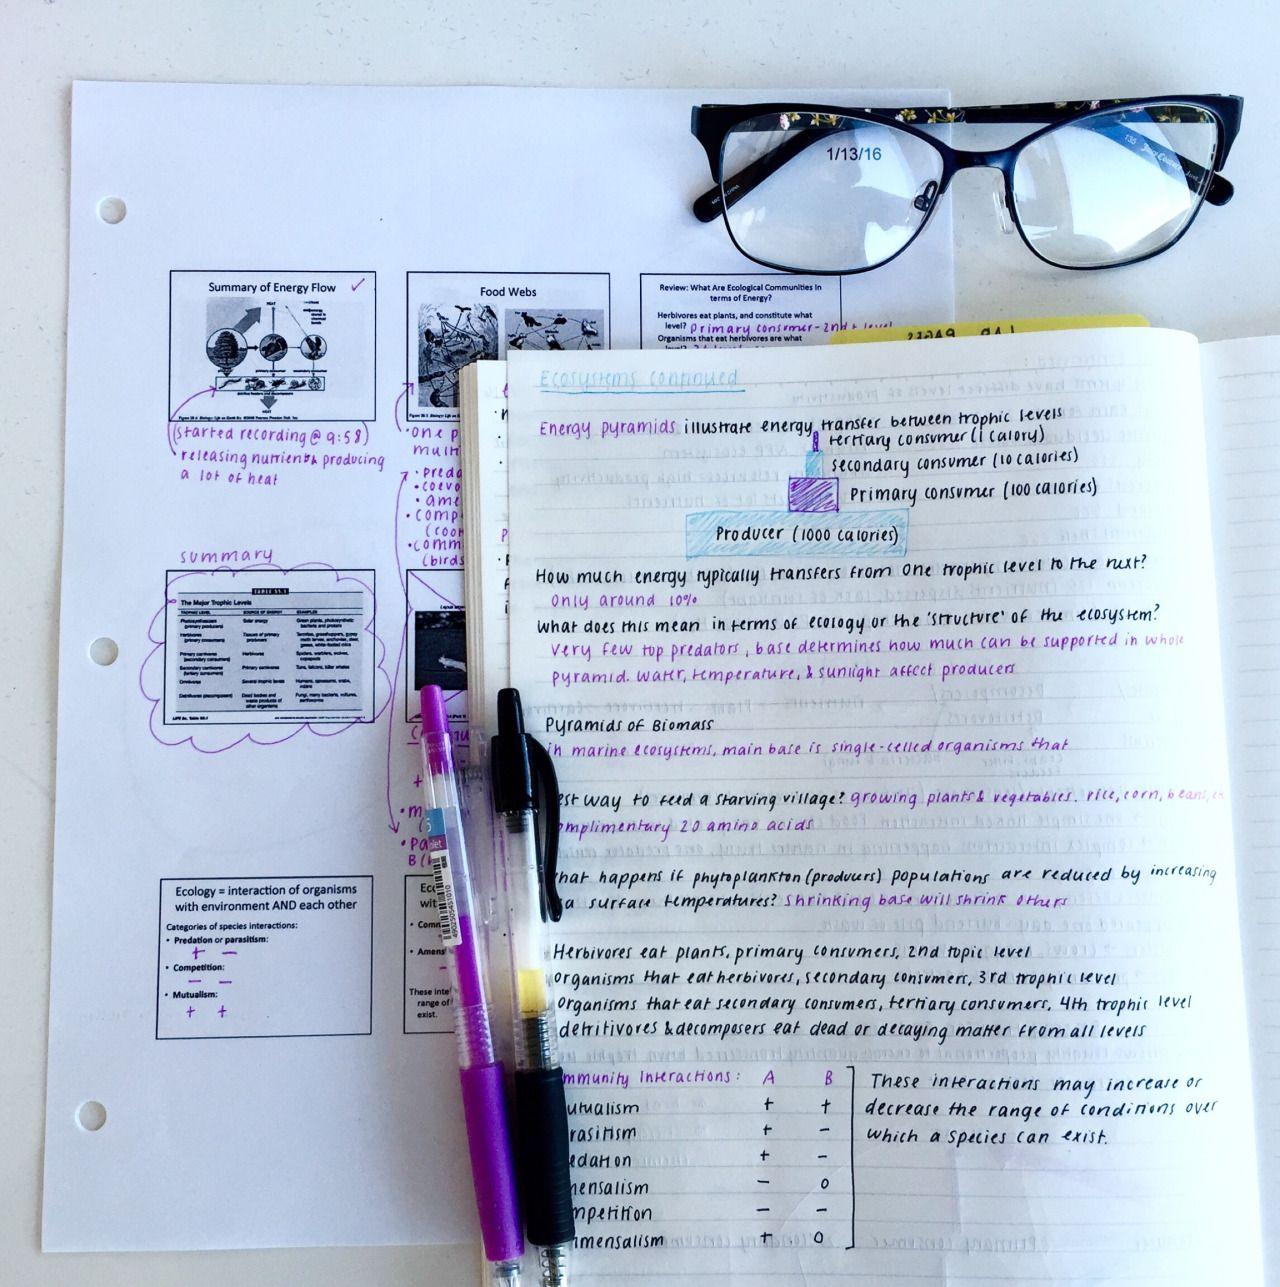 Nycdoe homework help